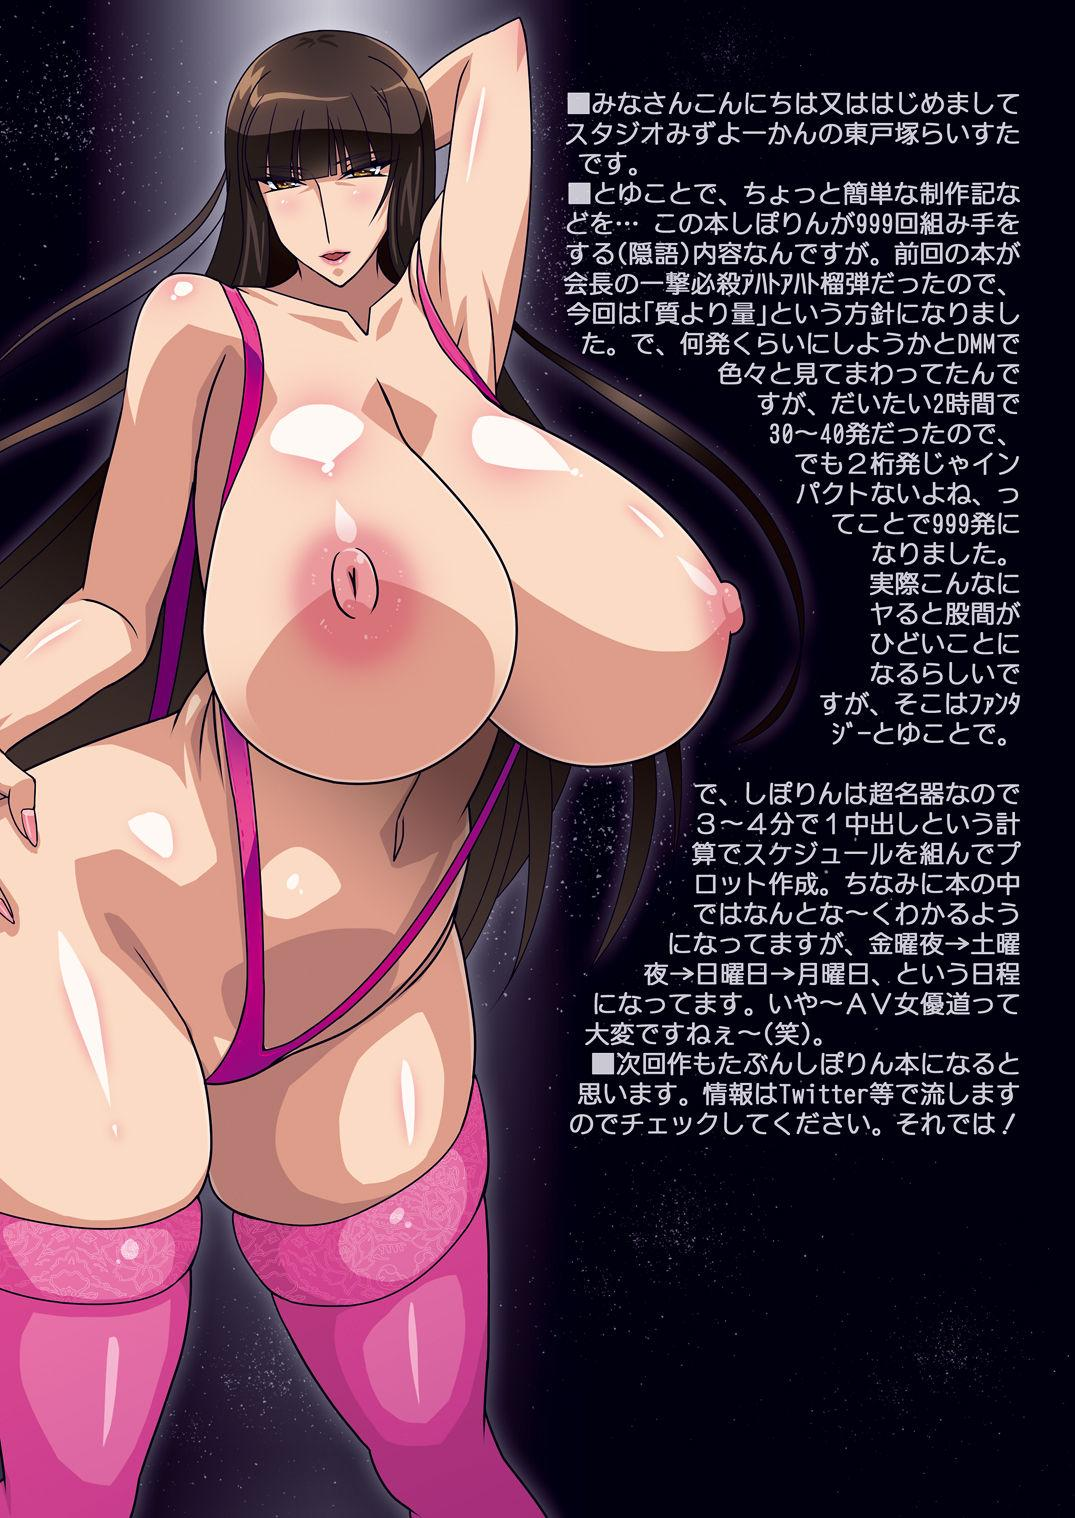 SHIHO 999 44